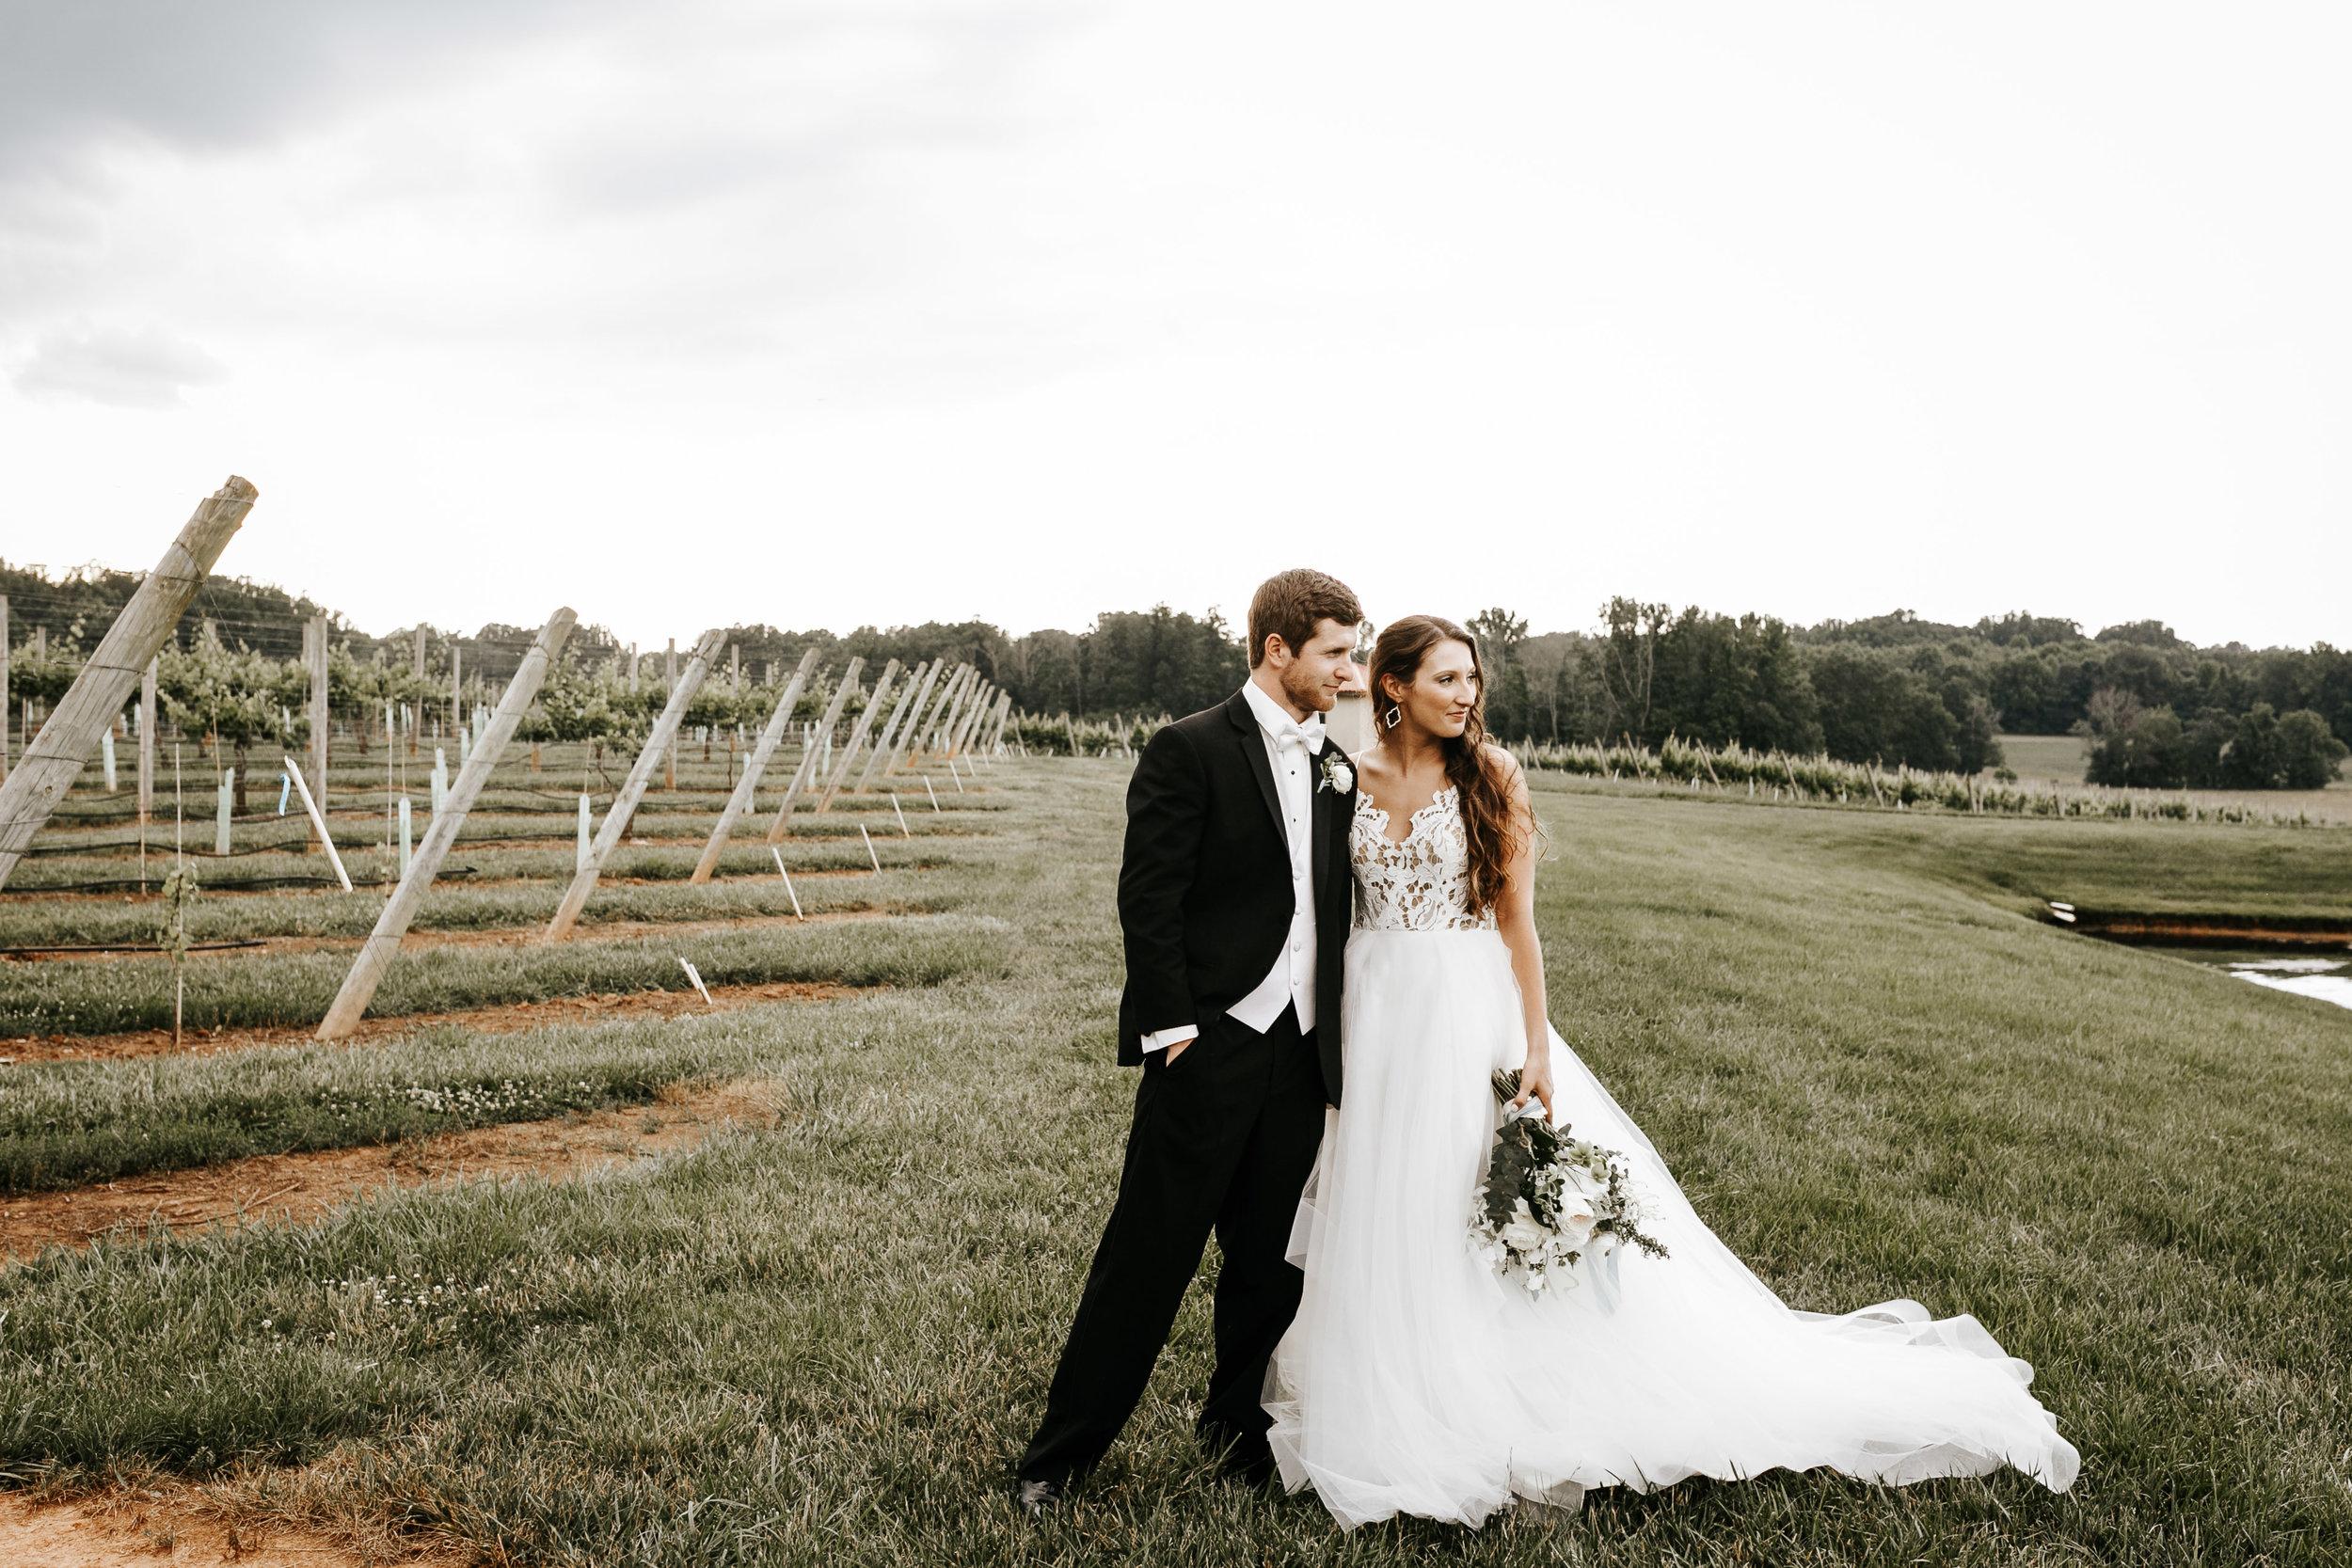 Bohemian-Wedding-Elopement-Photographer-Carolina-59.jpg